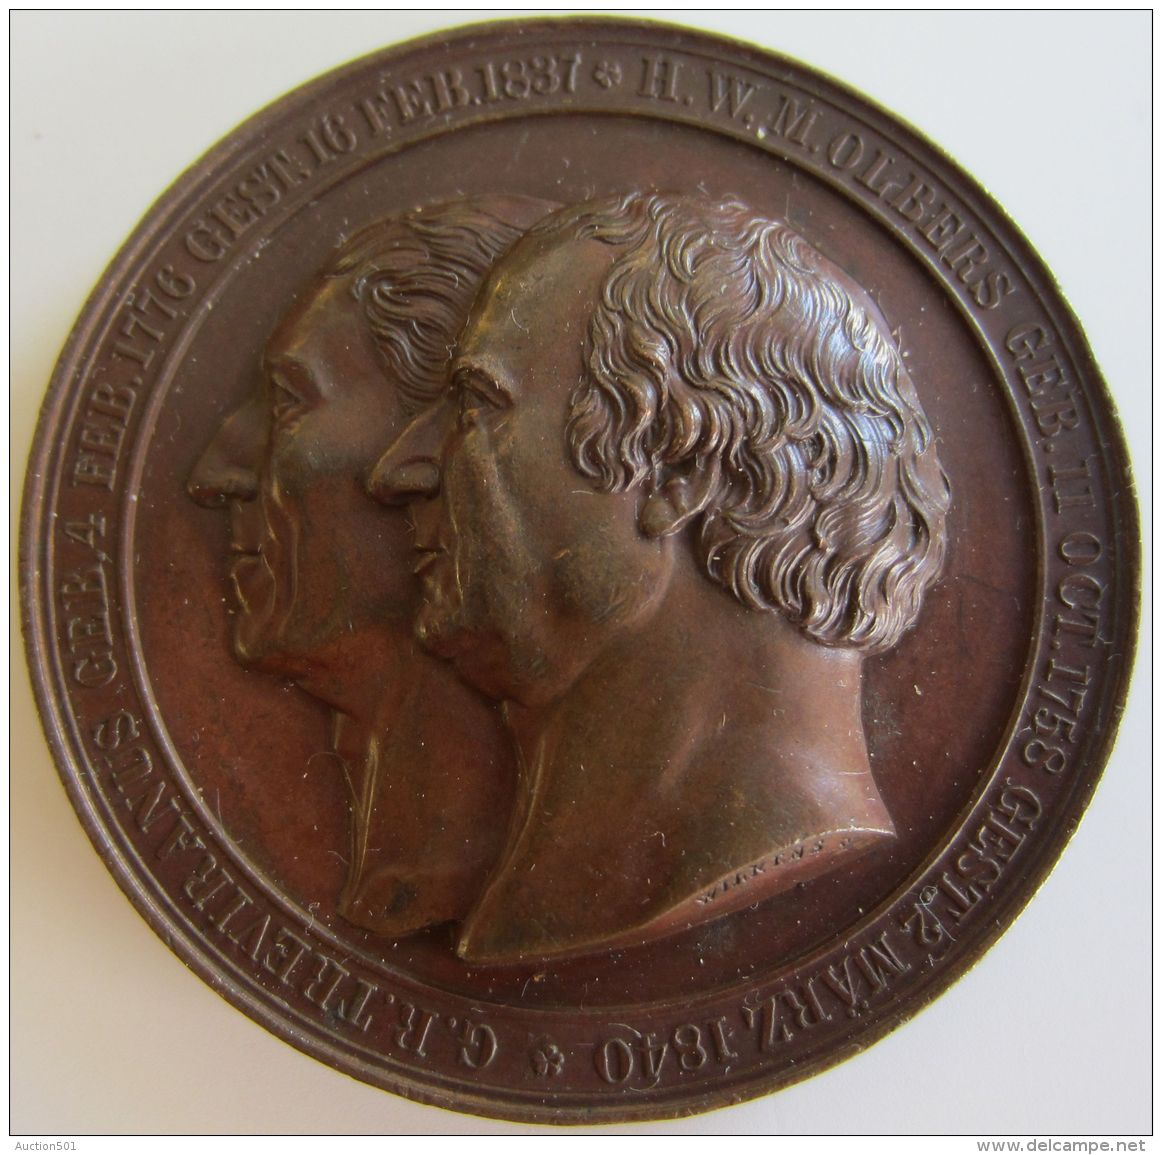 M01920  TREVIRANUS - OLBERS - PINGOUIN - DEUTSCHEN NATURFORSCHERN AERZTEN MUSEUM  BREMIEN 1844 -  Leurs Profils (66g) - Autres